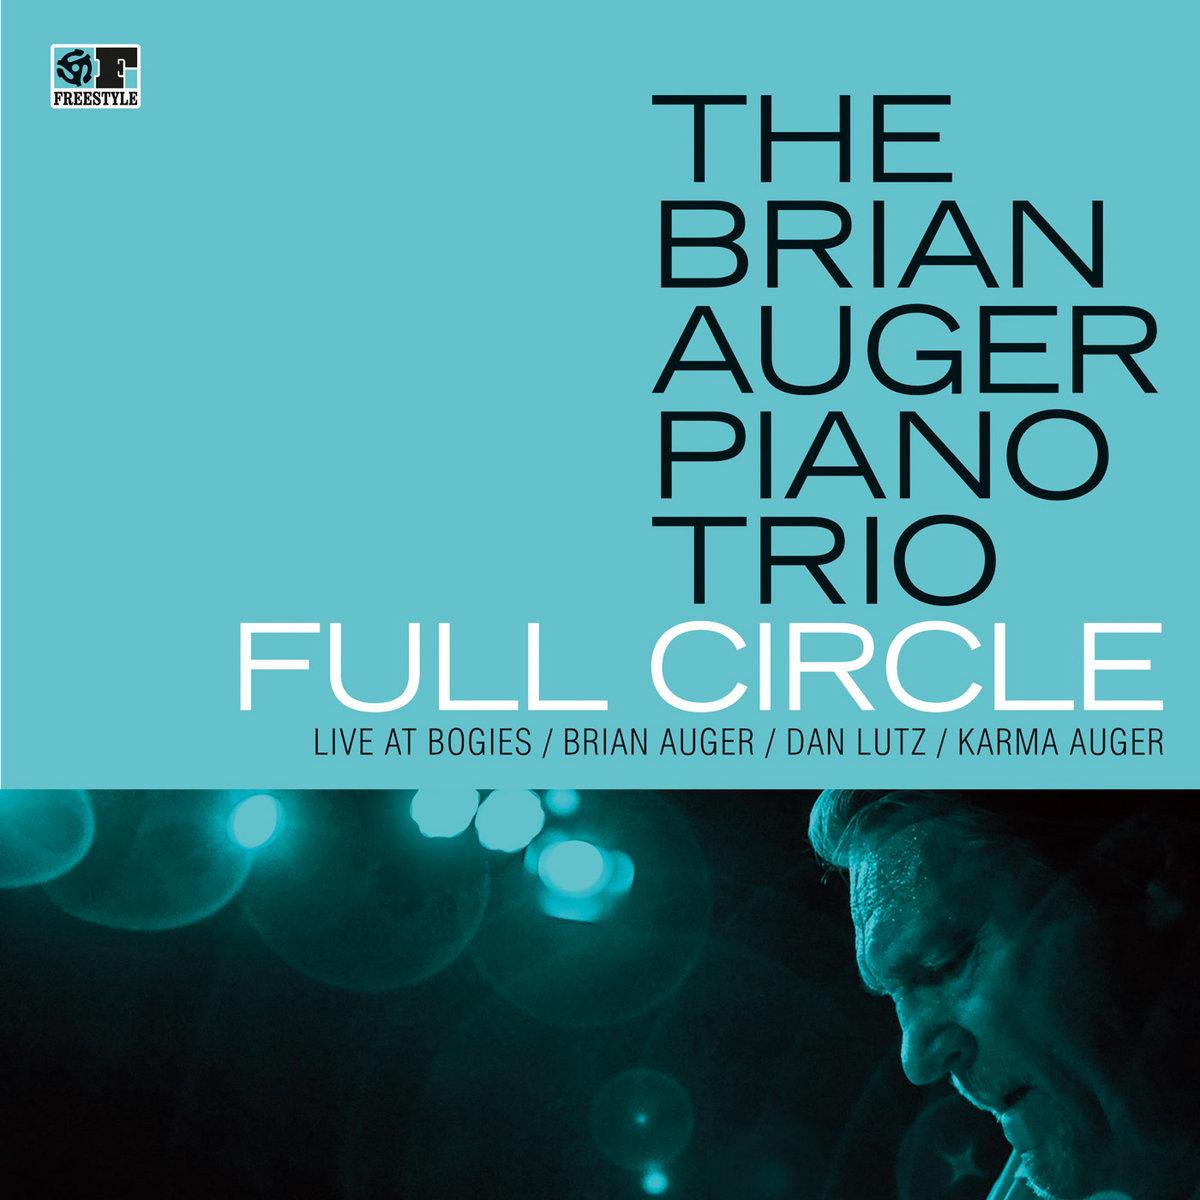 Full Circle - Live at Bogie's   Brian Auger